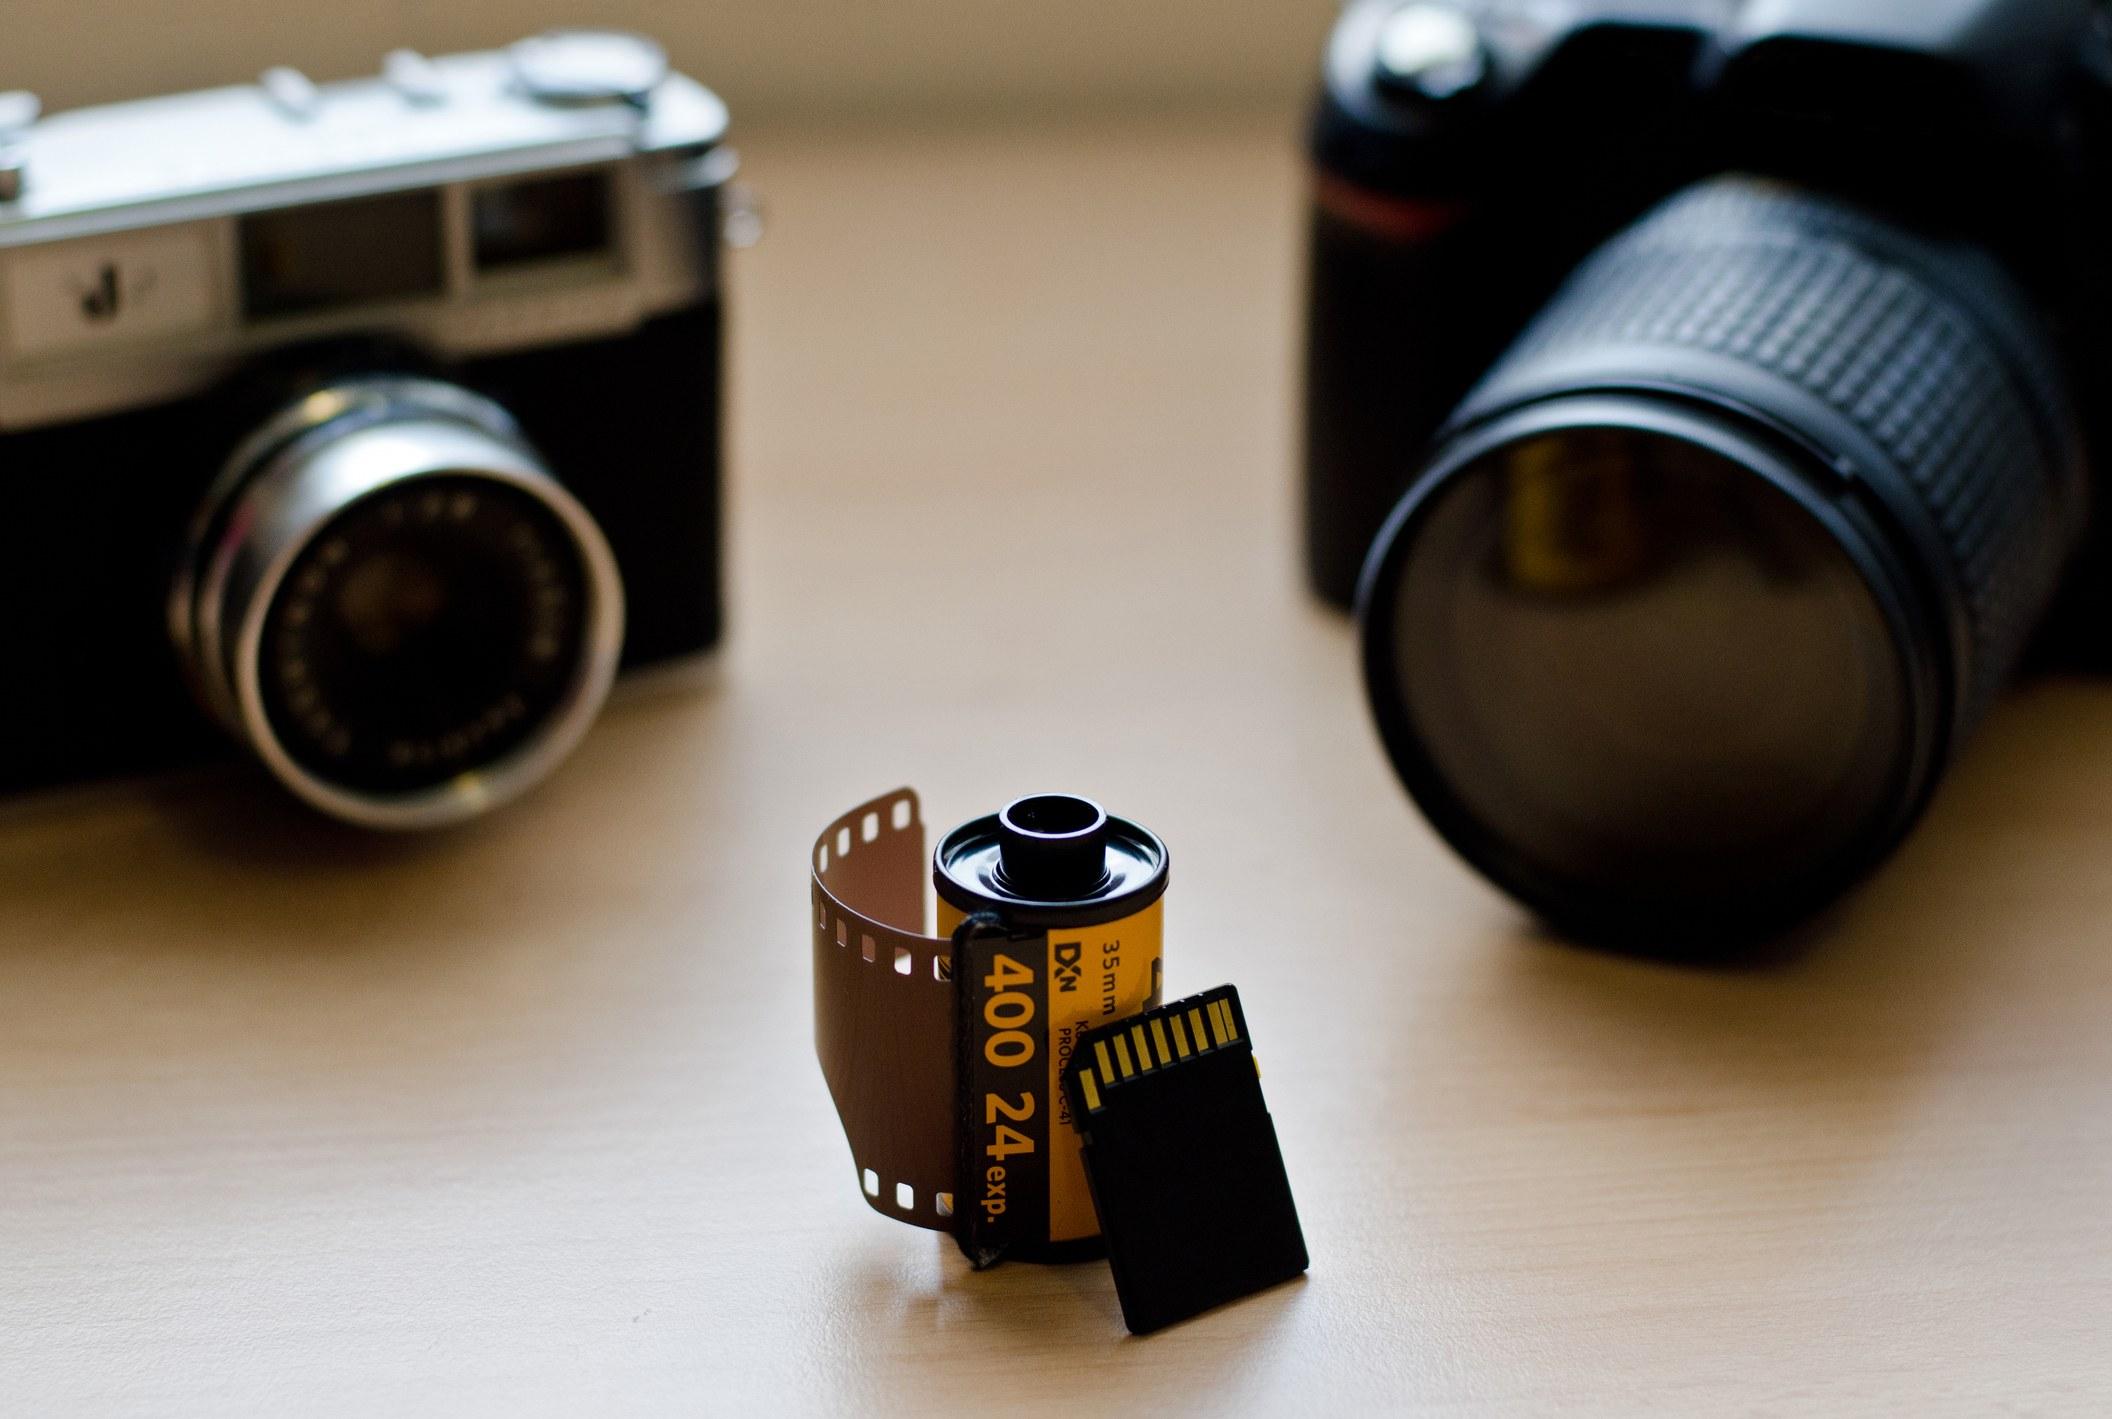 Film sitting between a digital and film camera